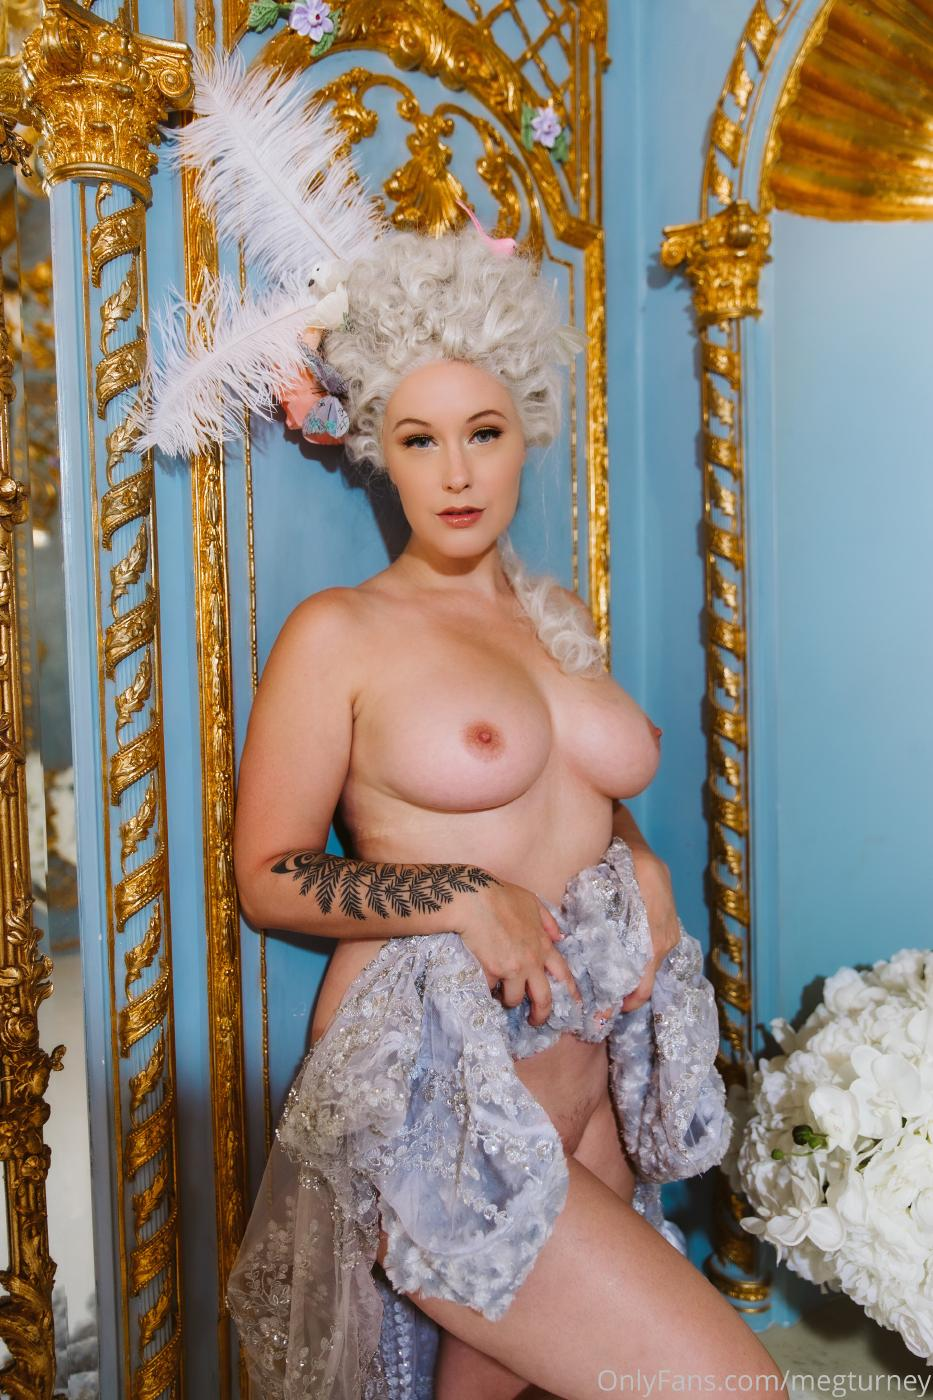 Meg Turney Nude Pussy Marie Antoinette Cosplay Onlyfans Set Leaked Zpdkxv